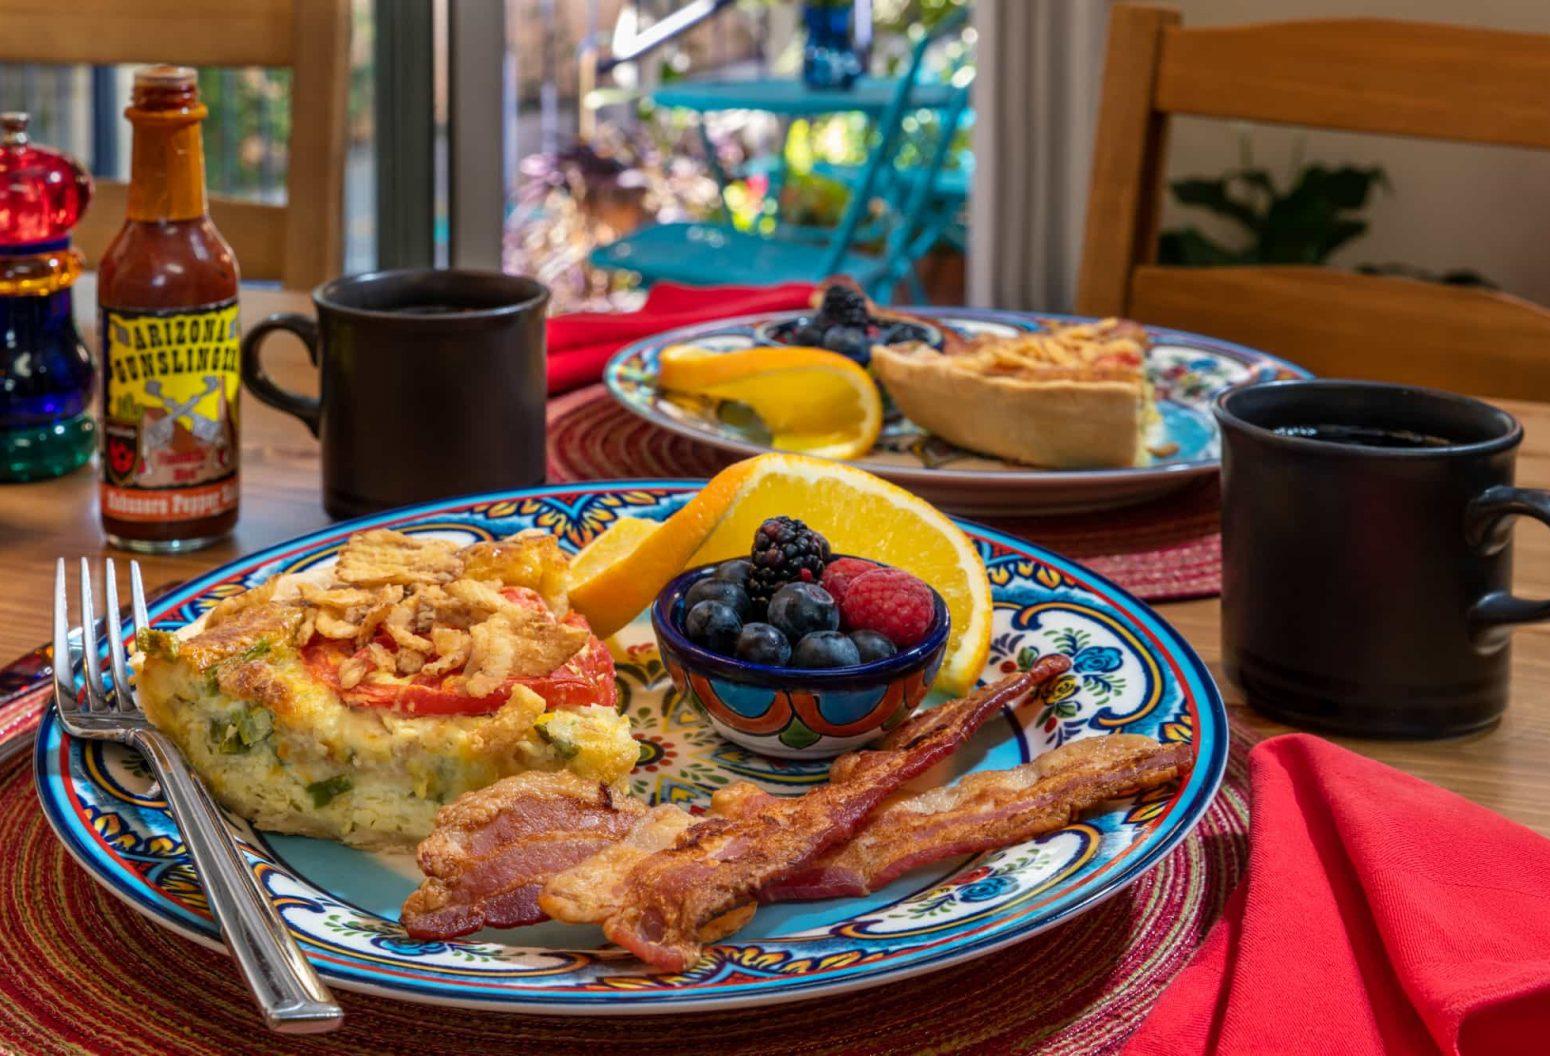 A hearty Southwest style breakfast at Adobe Rose Inn